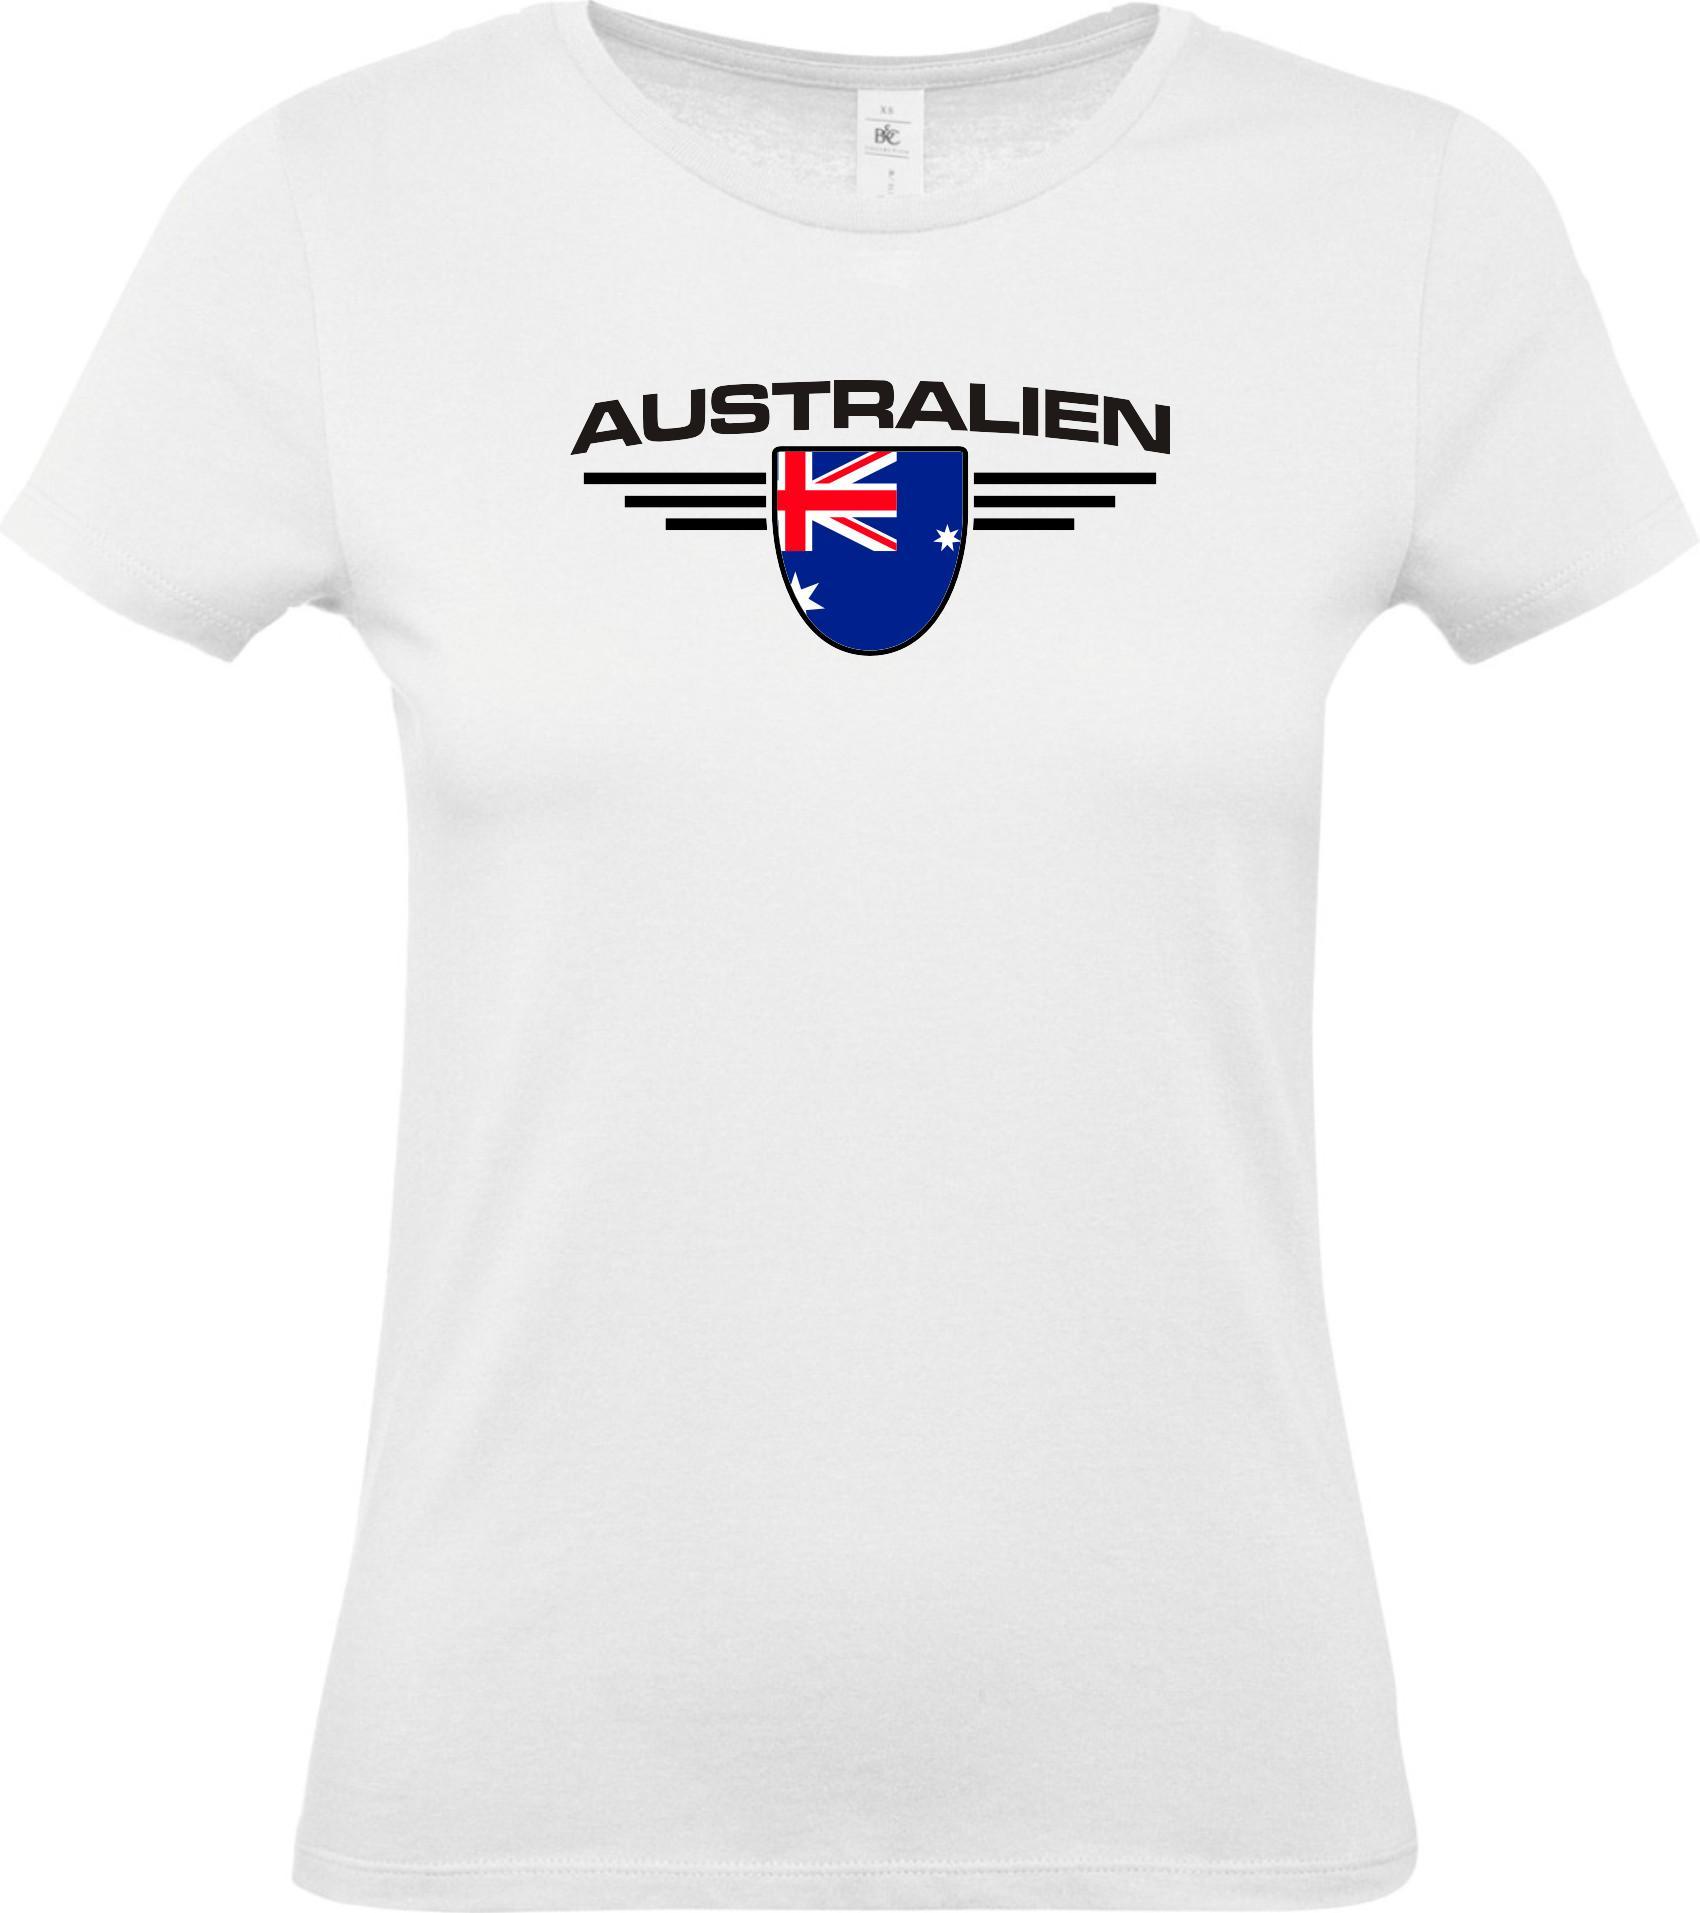 Lady-T-Shirt-Australien-Wappen-Land-Laender